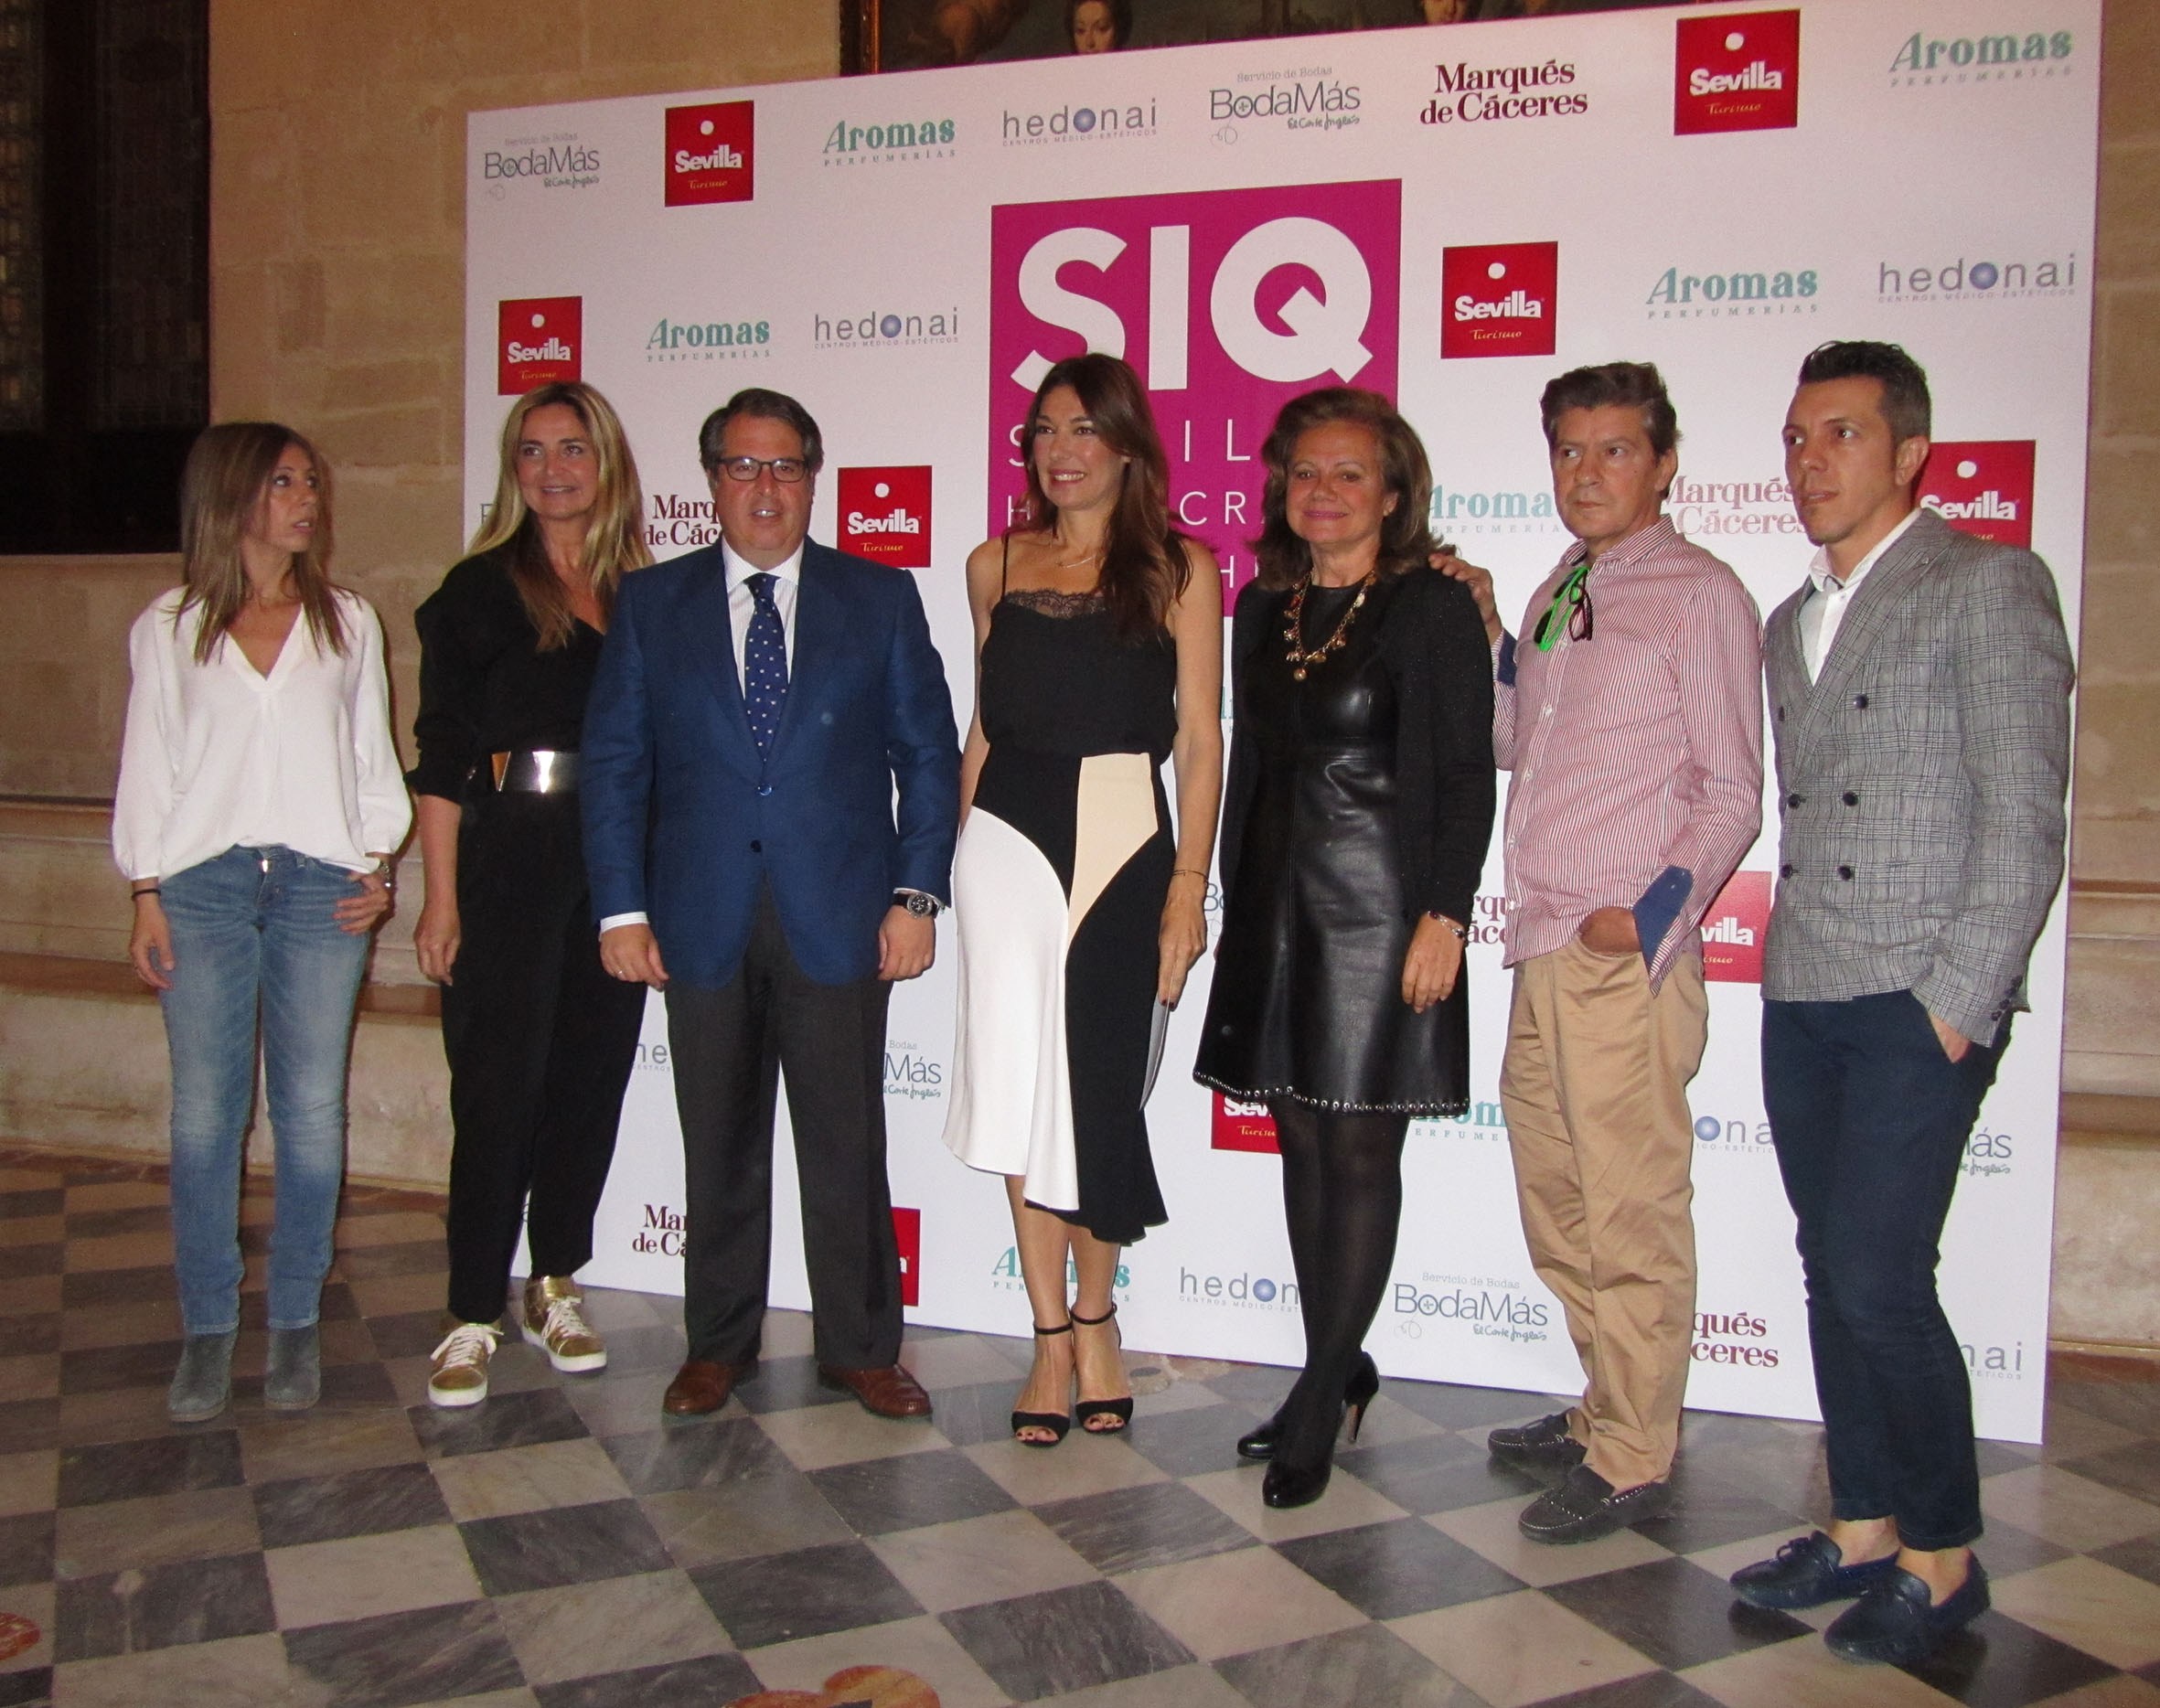 Presentada la 2ª edición de SIQ Sevilla